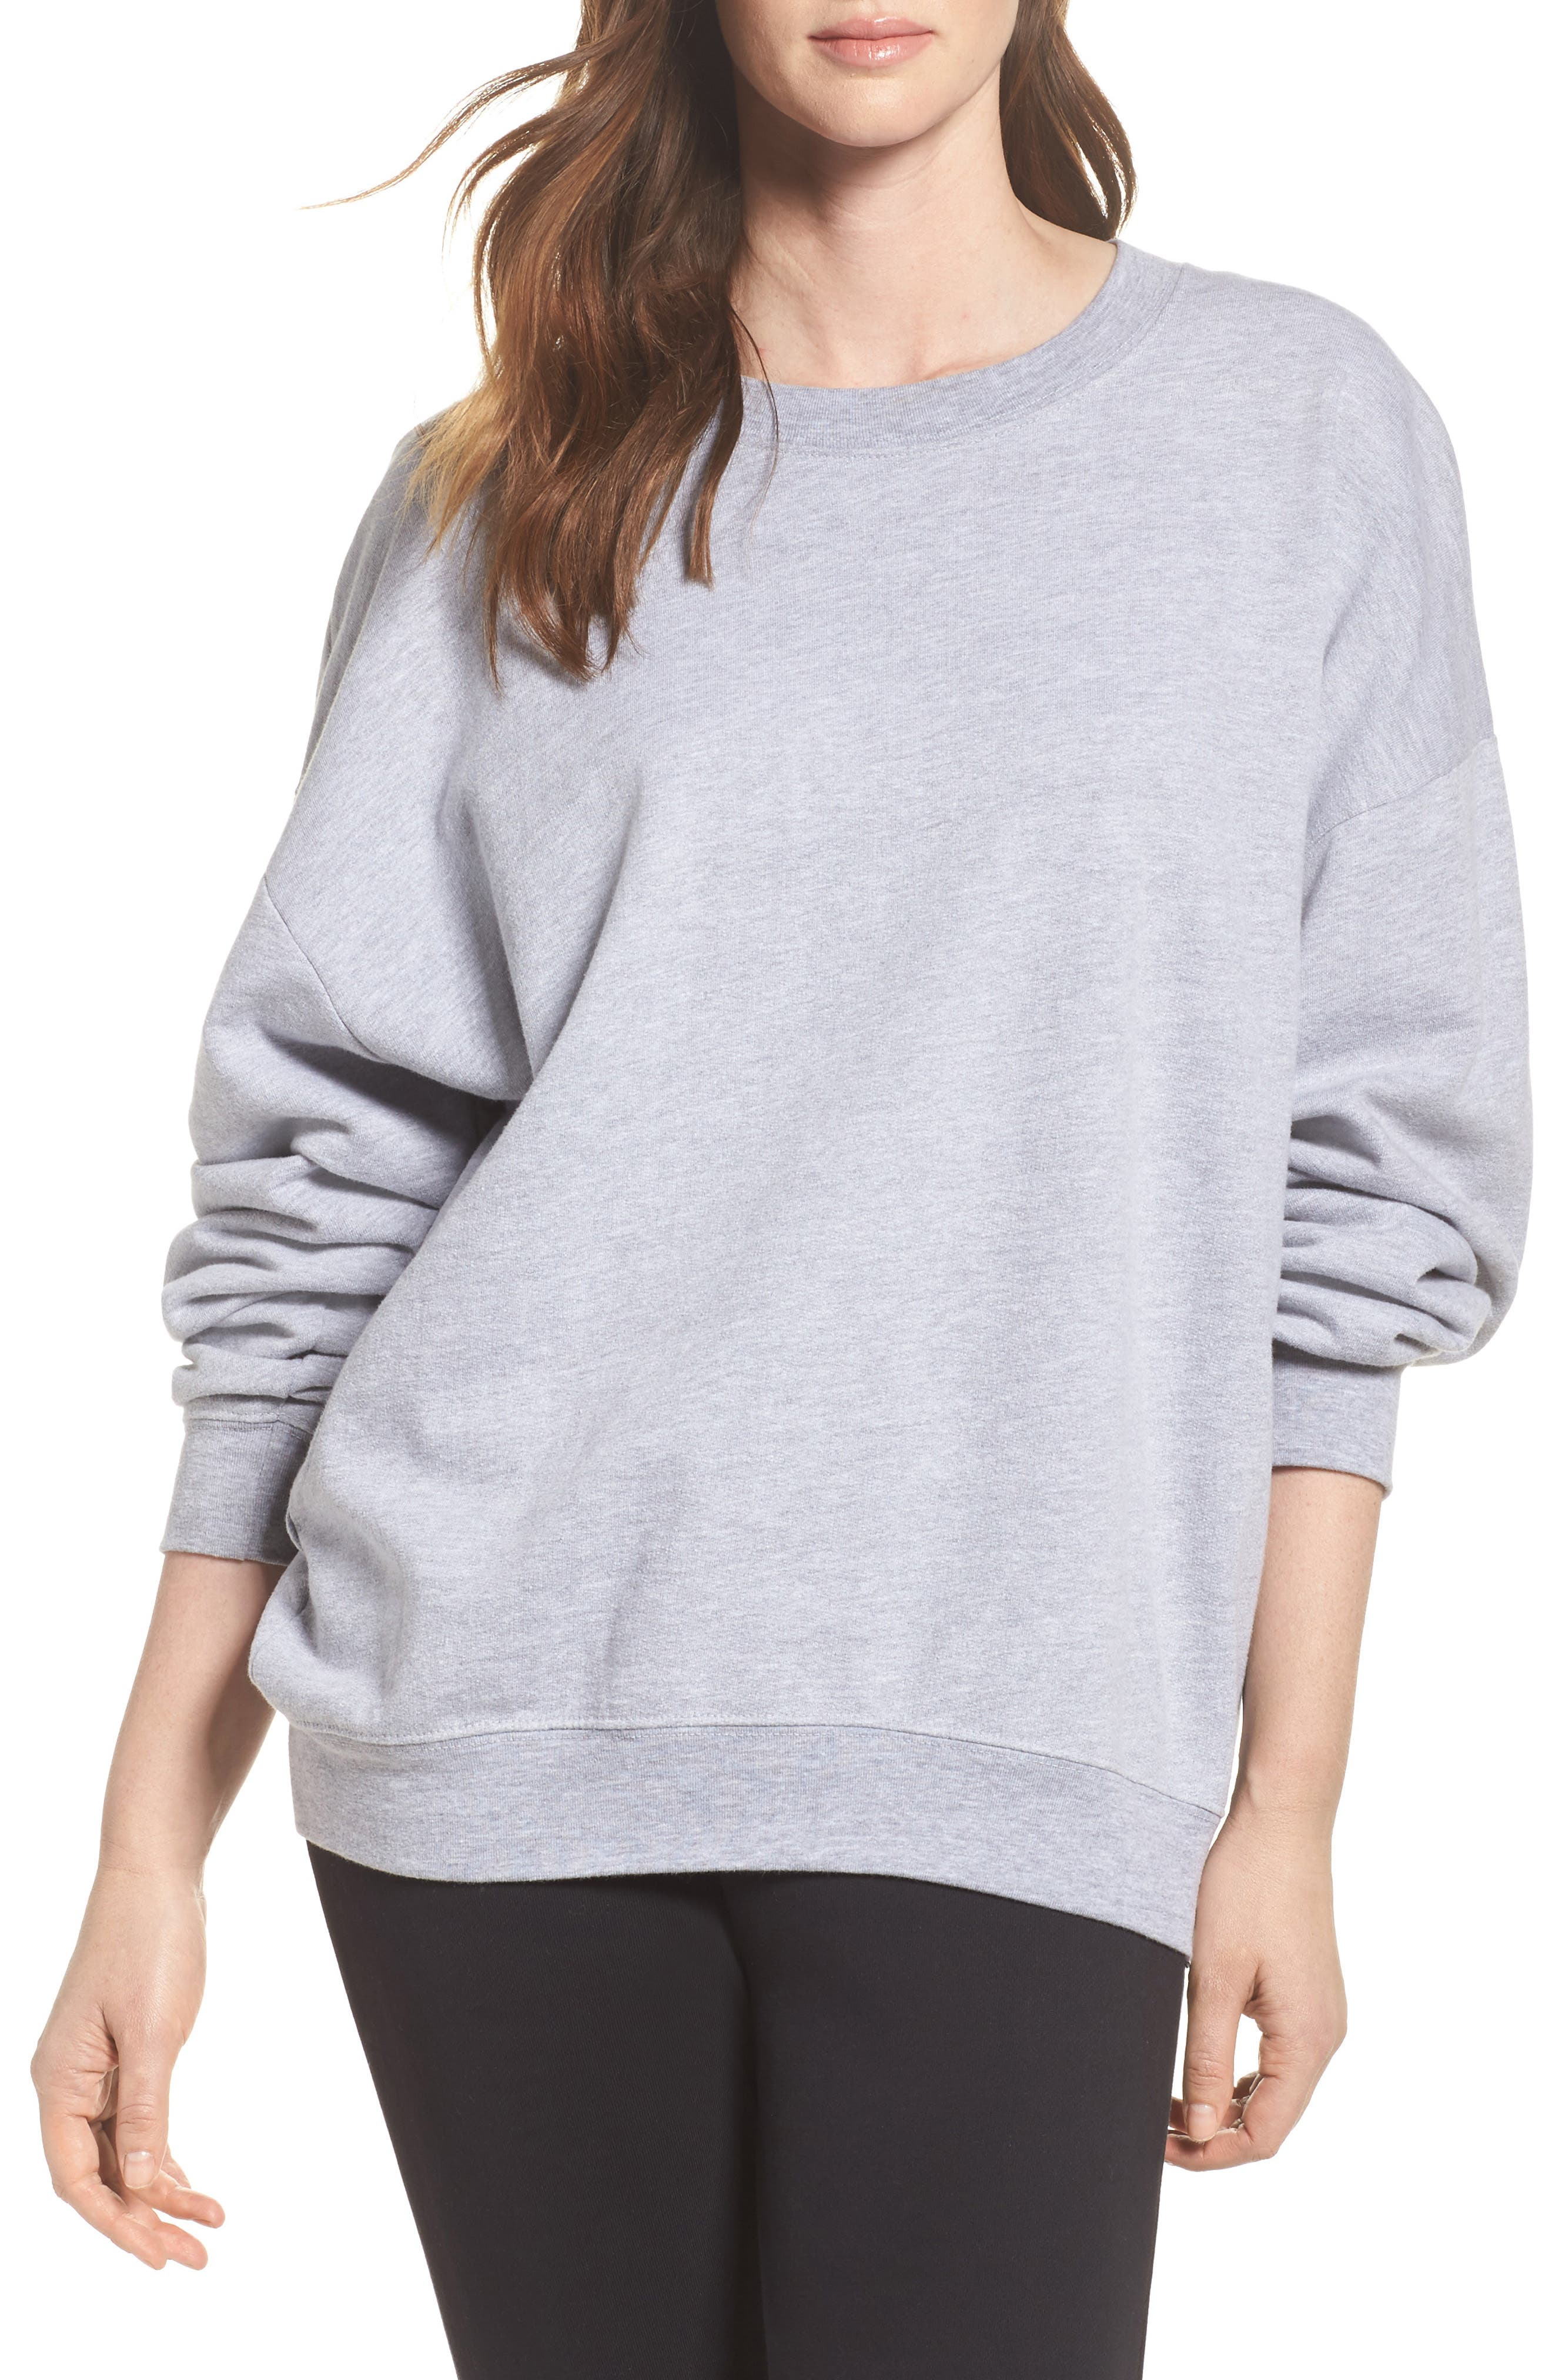 Ellstan Oversize Boyfriend Sweatshirt,                             Main thumbnail 1, color,                             035